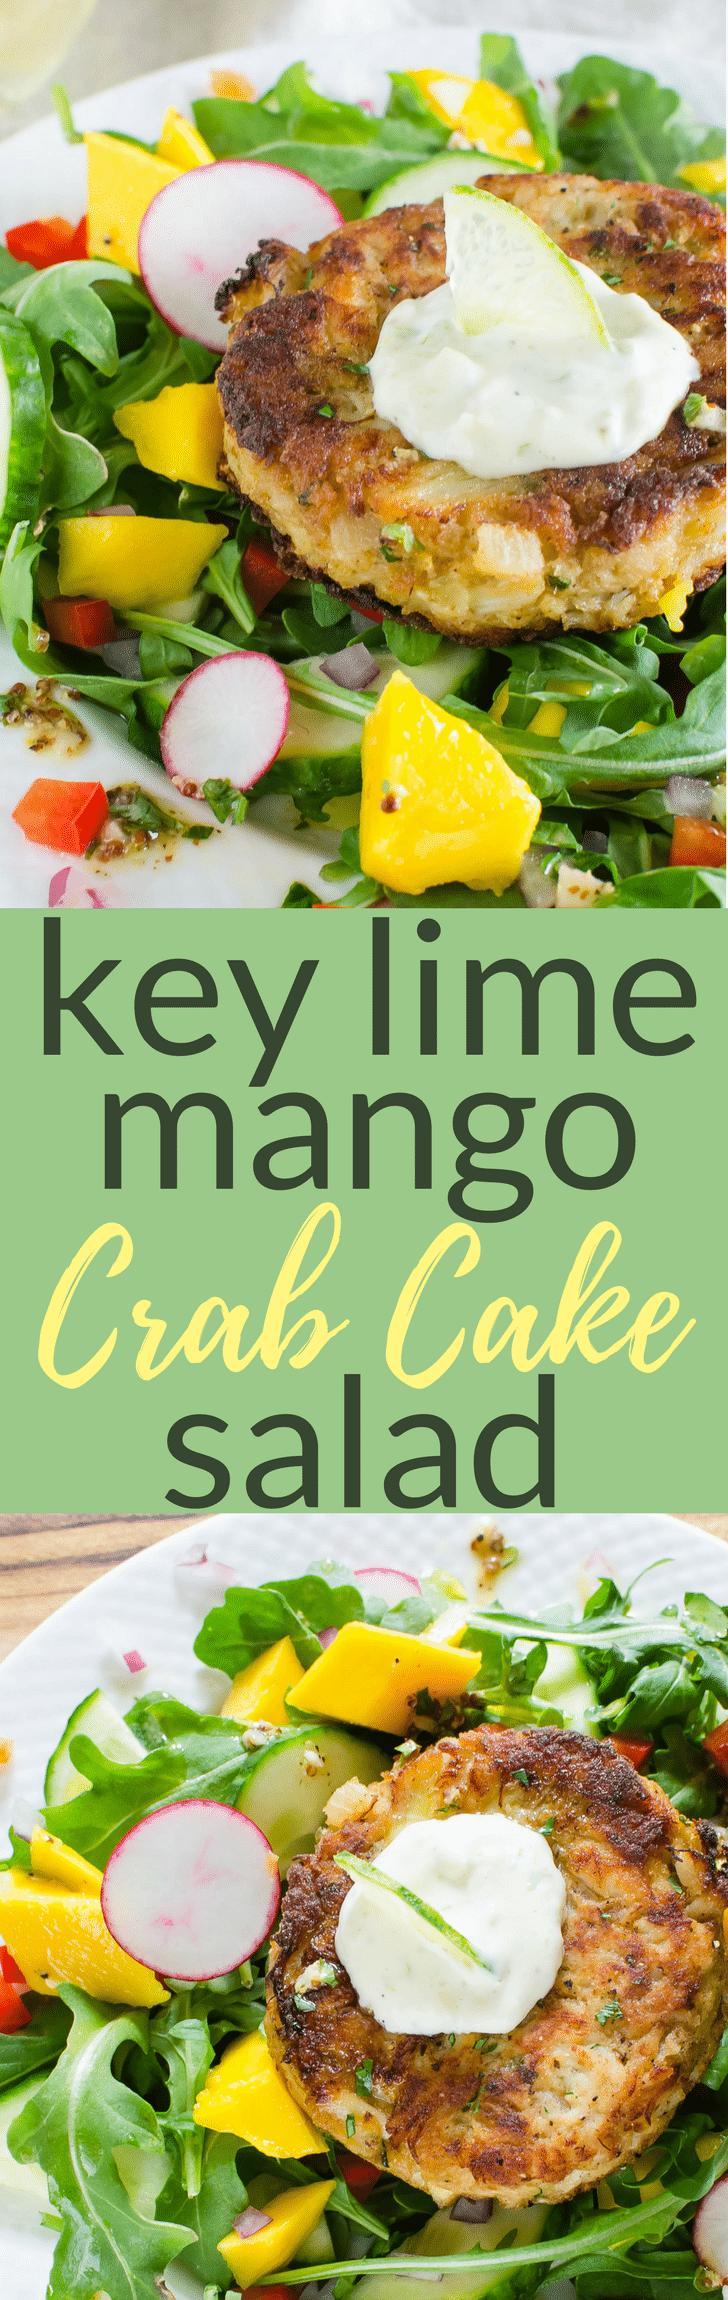 Want the BEST crab cake salad recipe?  Key Lime Mango Crab Cake Salad w/ tropical key lime dressing, chunks of mango and crunchy veg. Like an island vacation! #crab #crabcake #crabcakesalad #salad #tropicalsalad #mangoes #keylime #keylimedressing #easysaladrecipe #seafoodsaladrecipe #keylime #citrusdressing #homemadecrabcakes #bestcrabcakesalad #lowcarbsalad